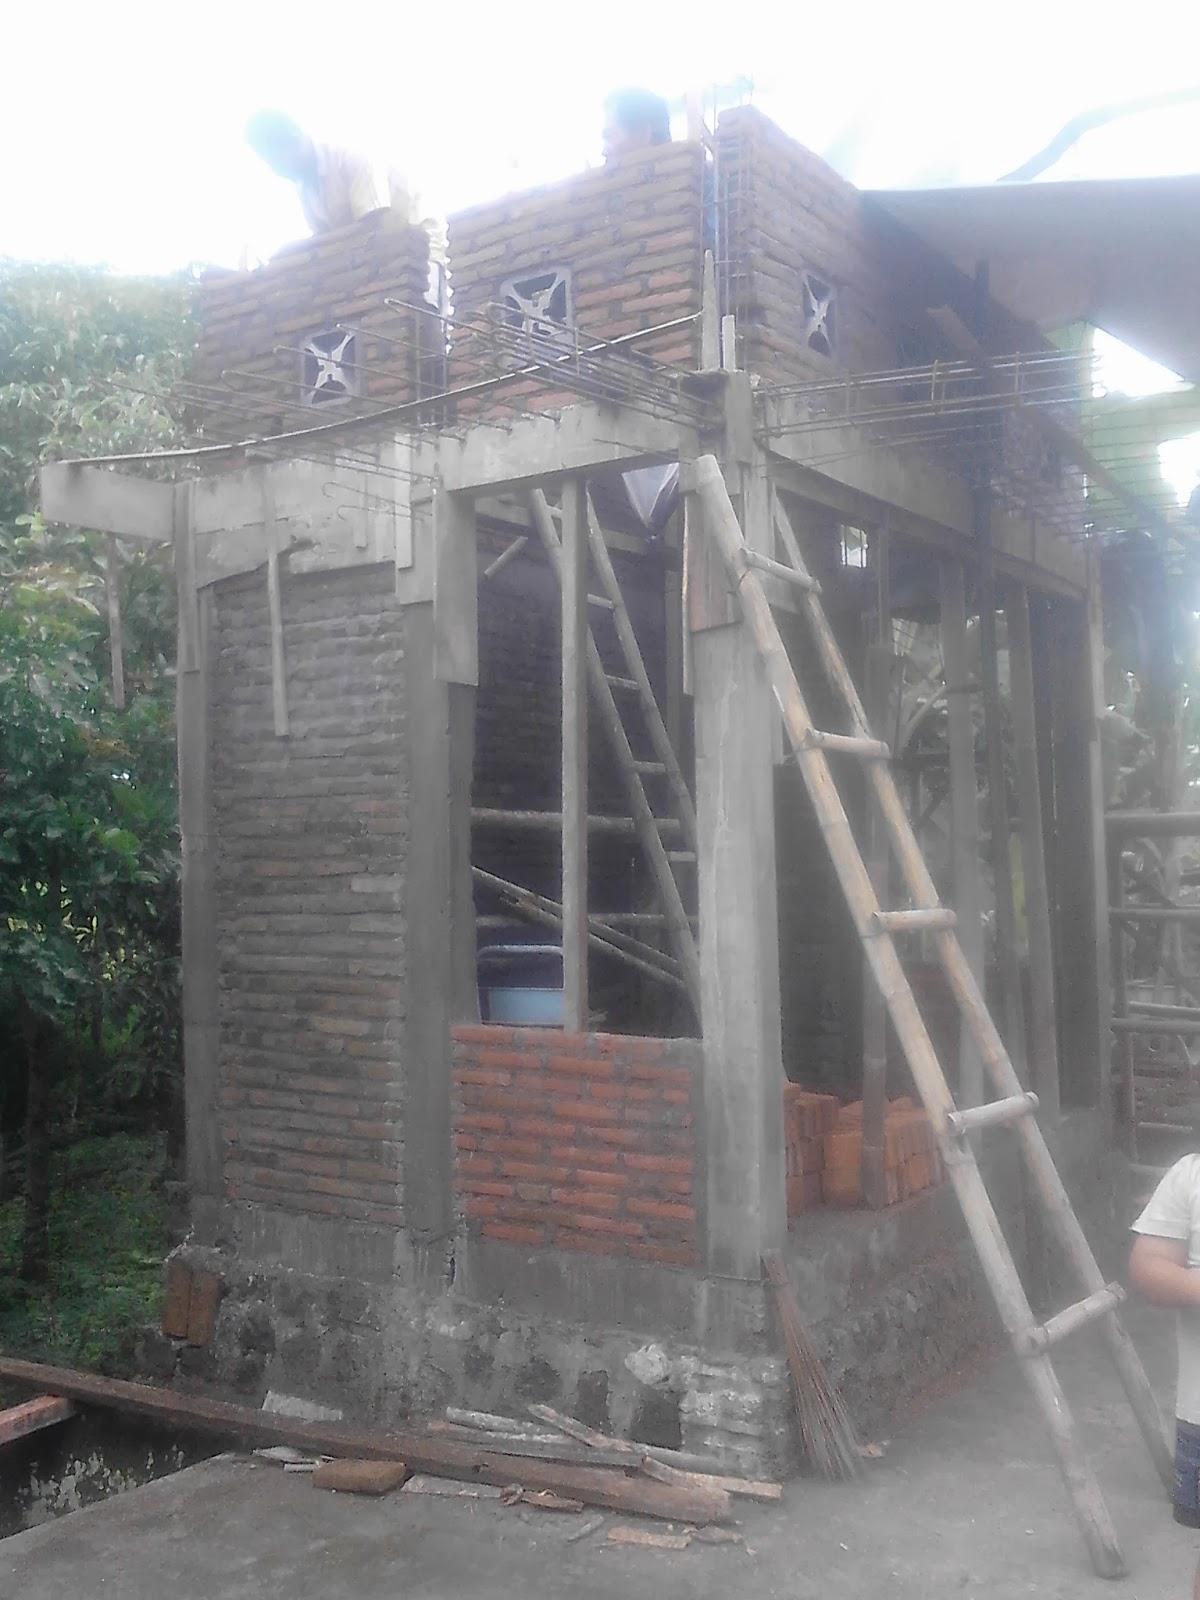 RW 5 Karanglo, Karangdukuh: (Update) Pembangunan Poskamling